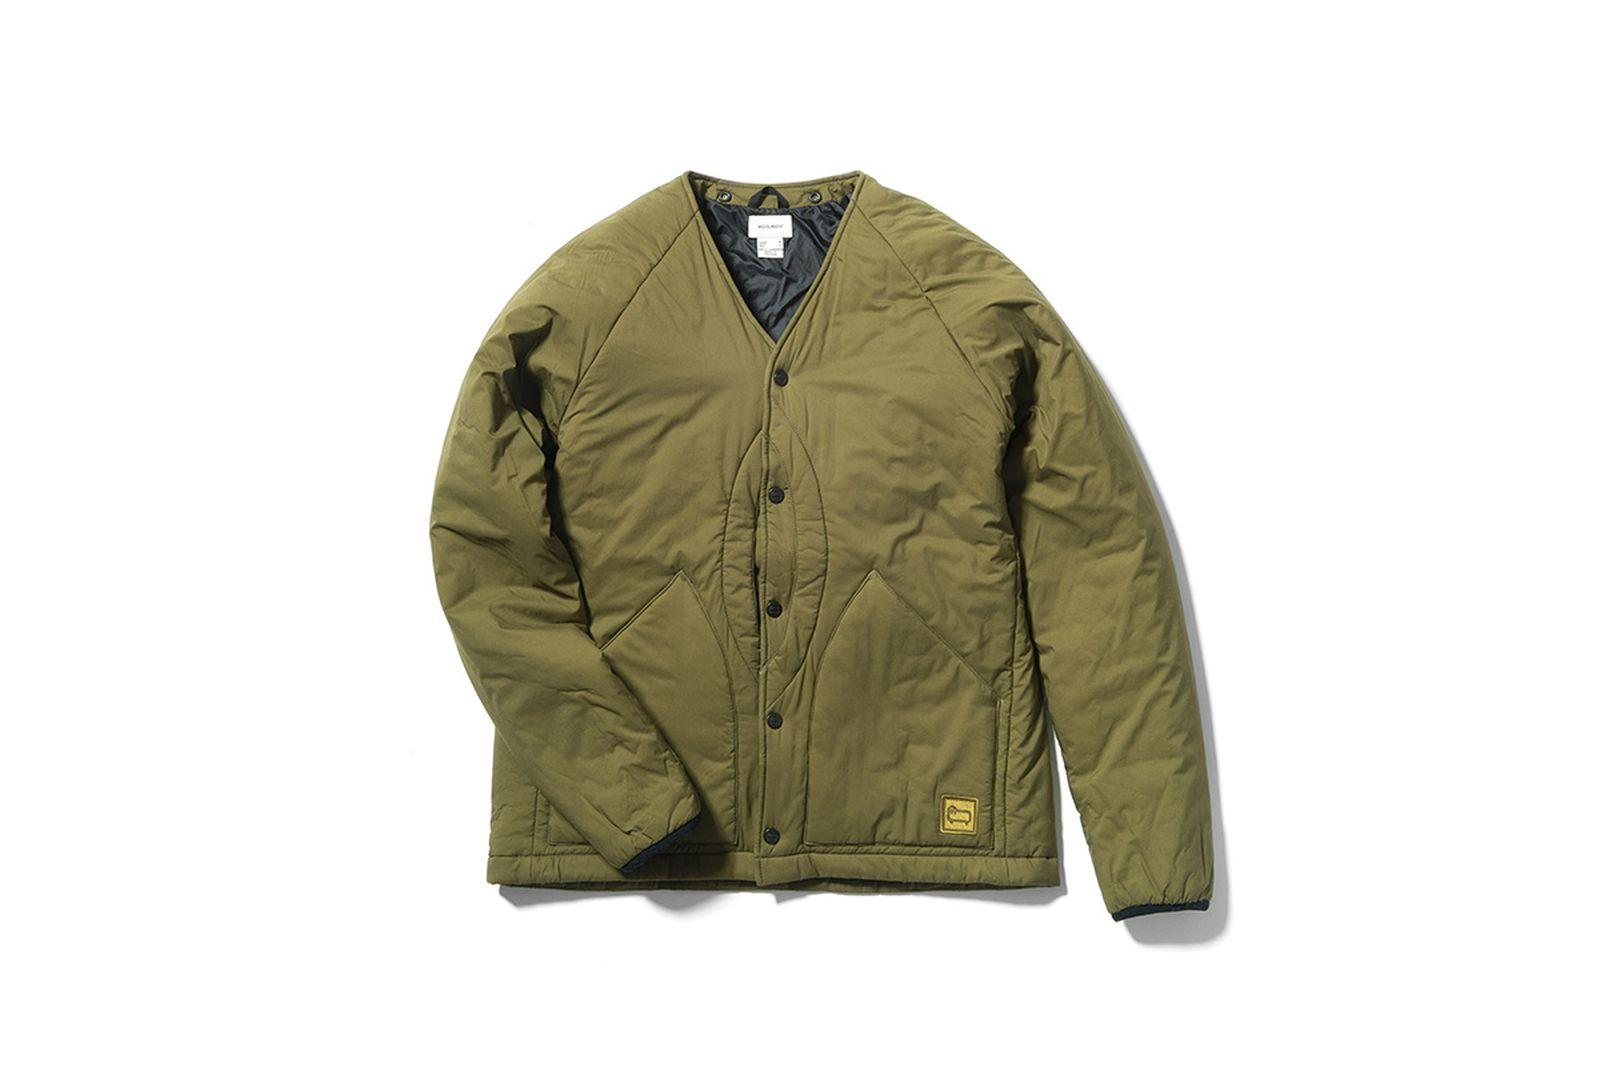 woolrich-outdoor-fallwinter-2021-collection-05